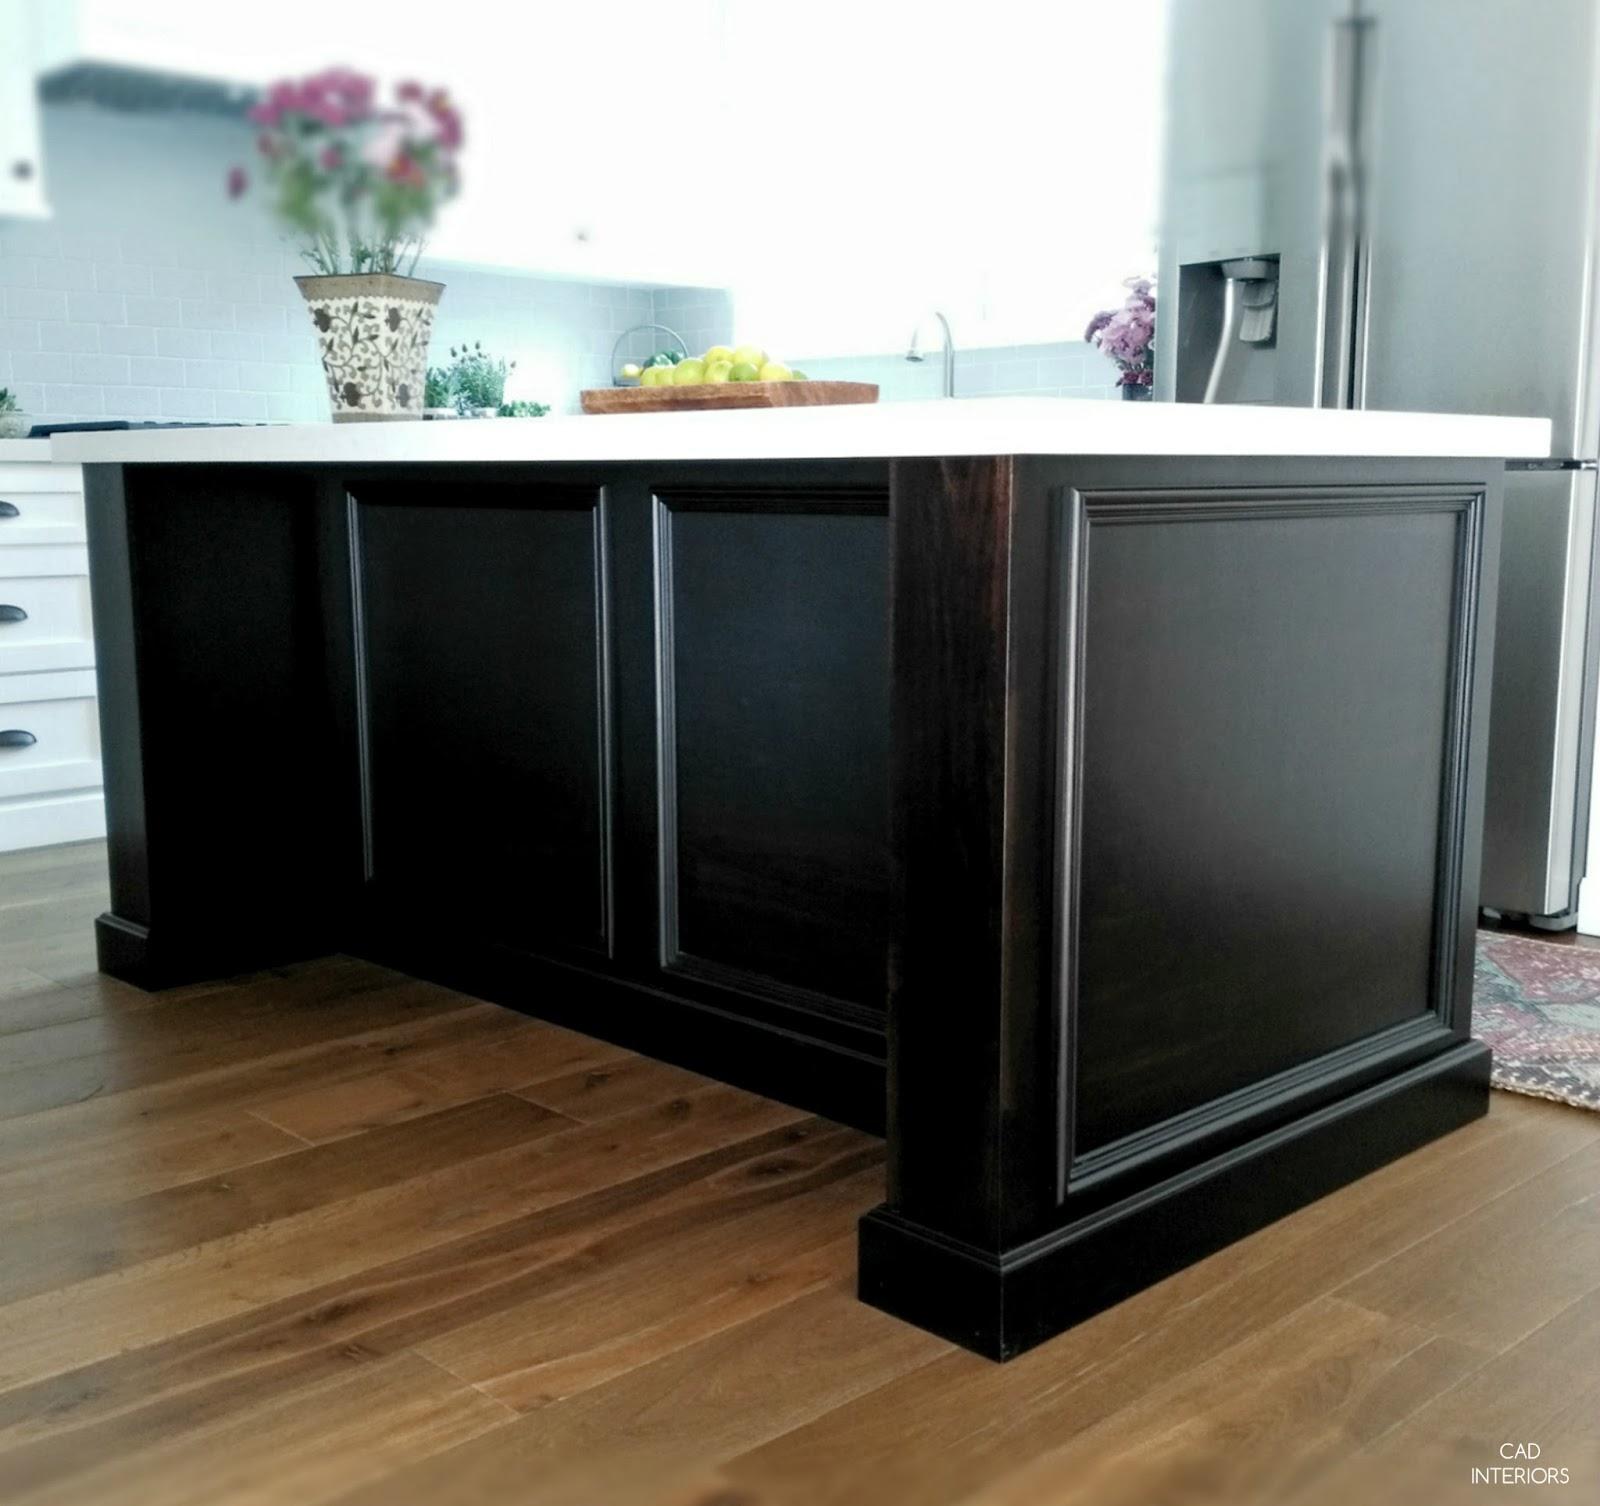 CAD INTERIORS kitchen renovation